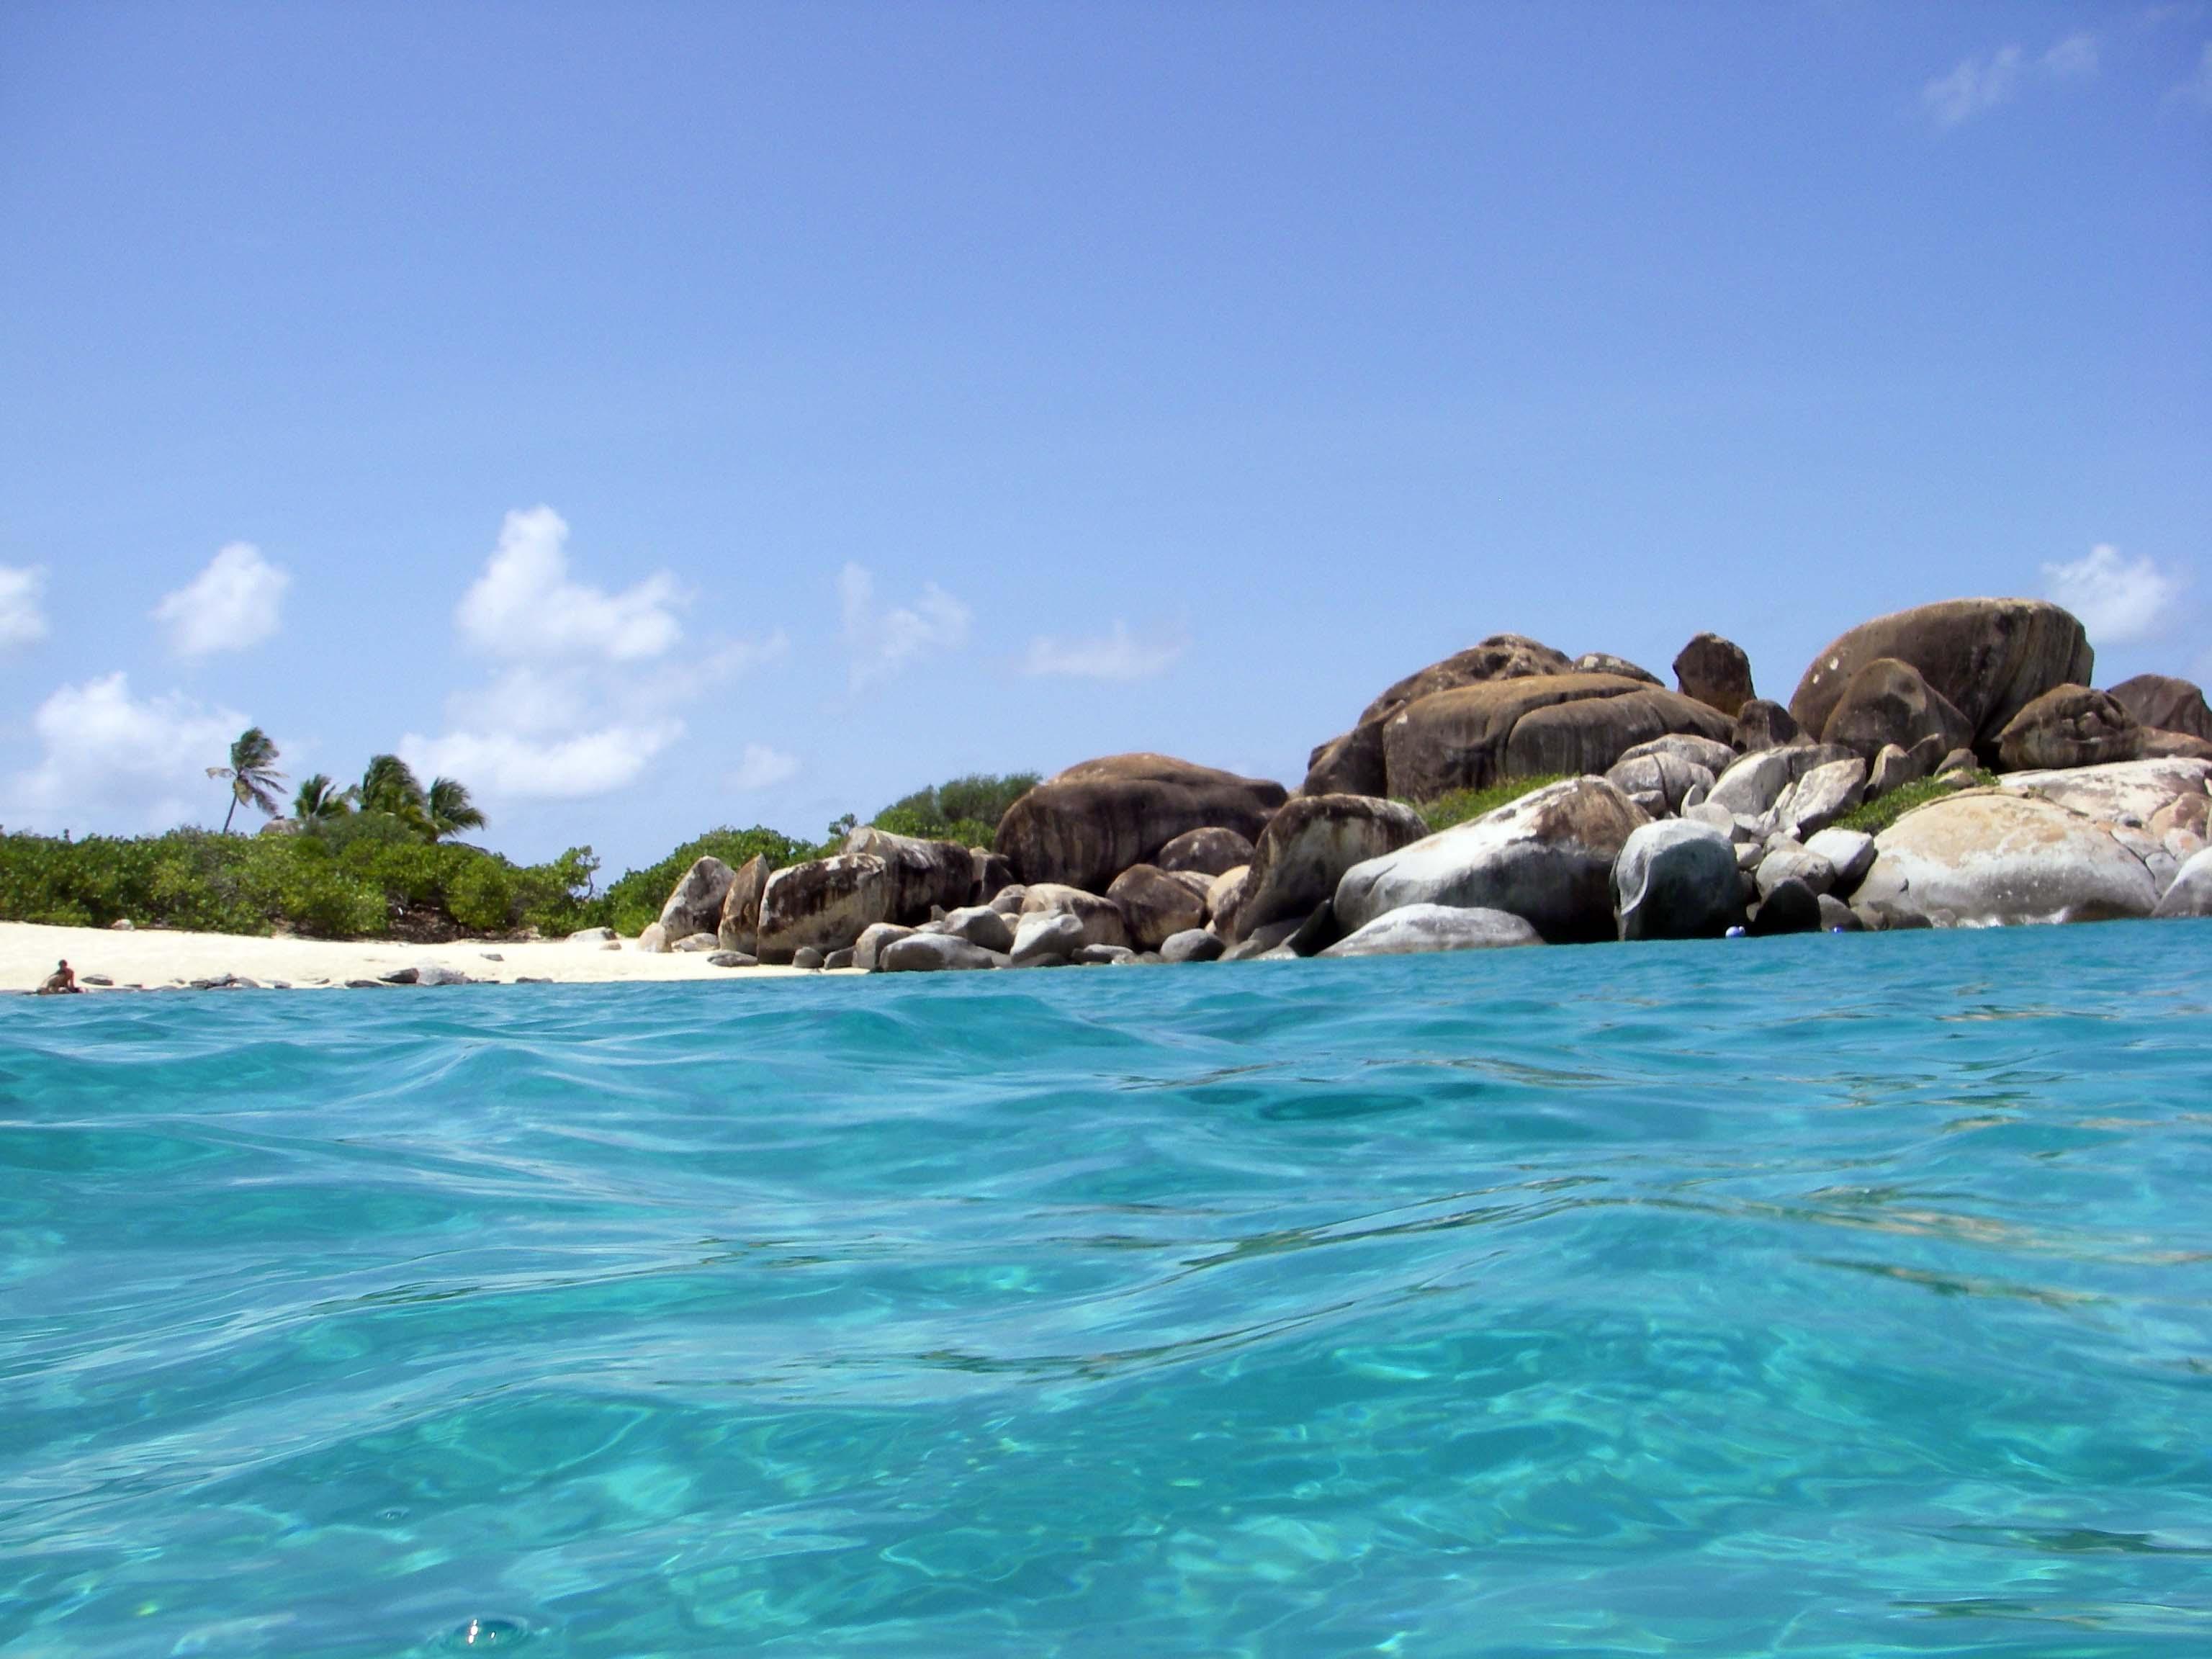 The Baths, Virgin Gorda Island, British Virgin Islands, West Indies  № 1471461 загрузить